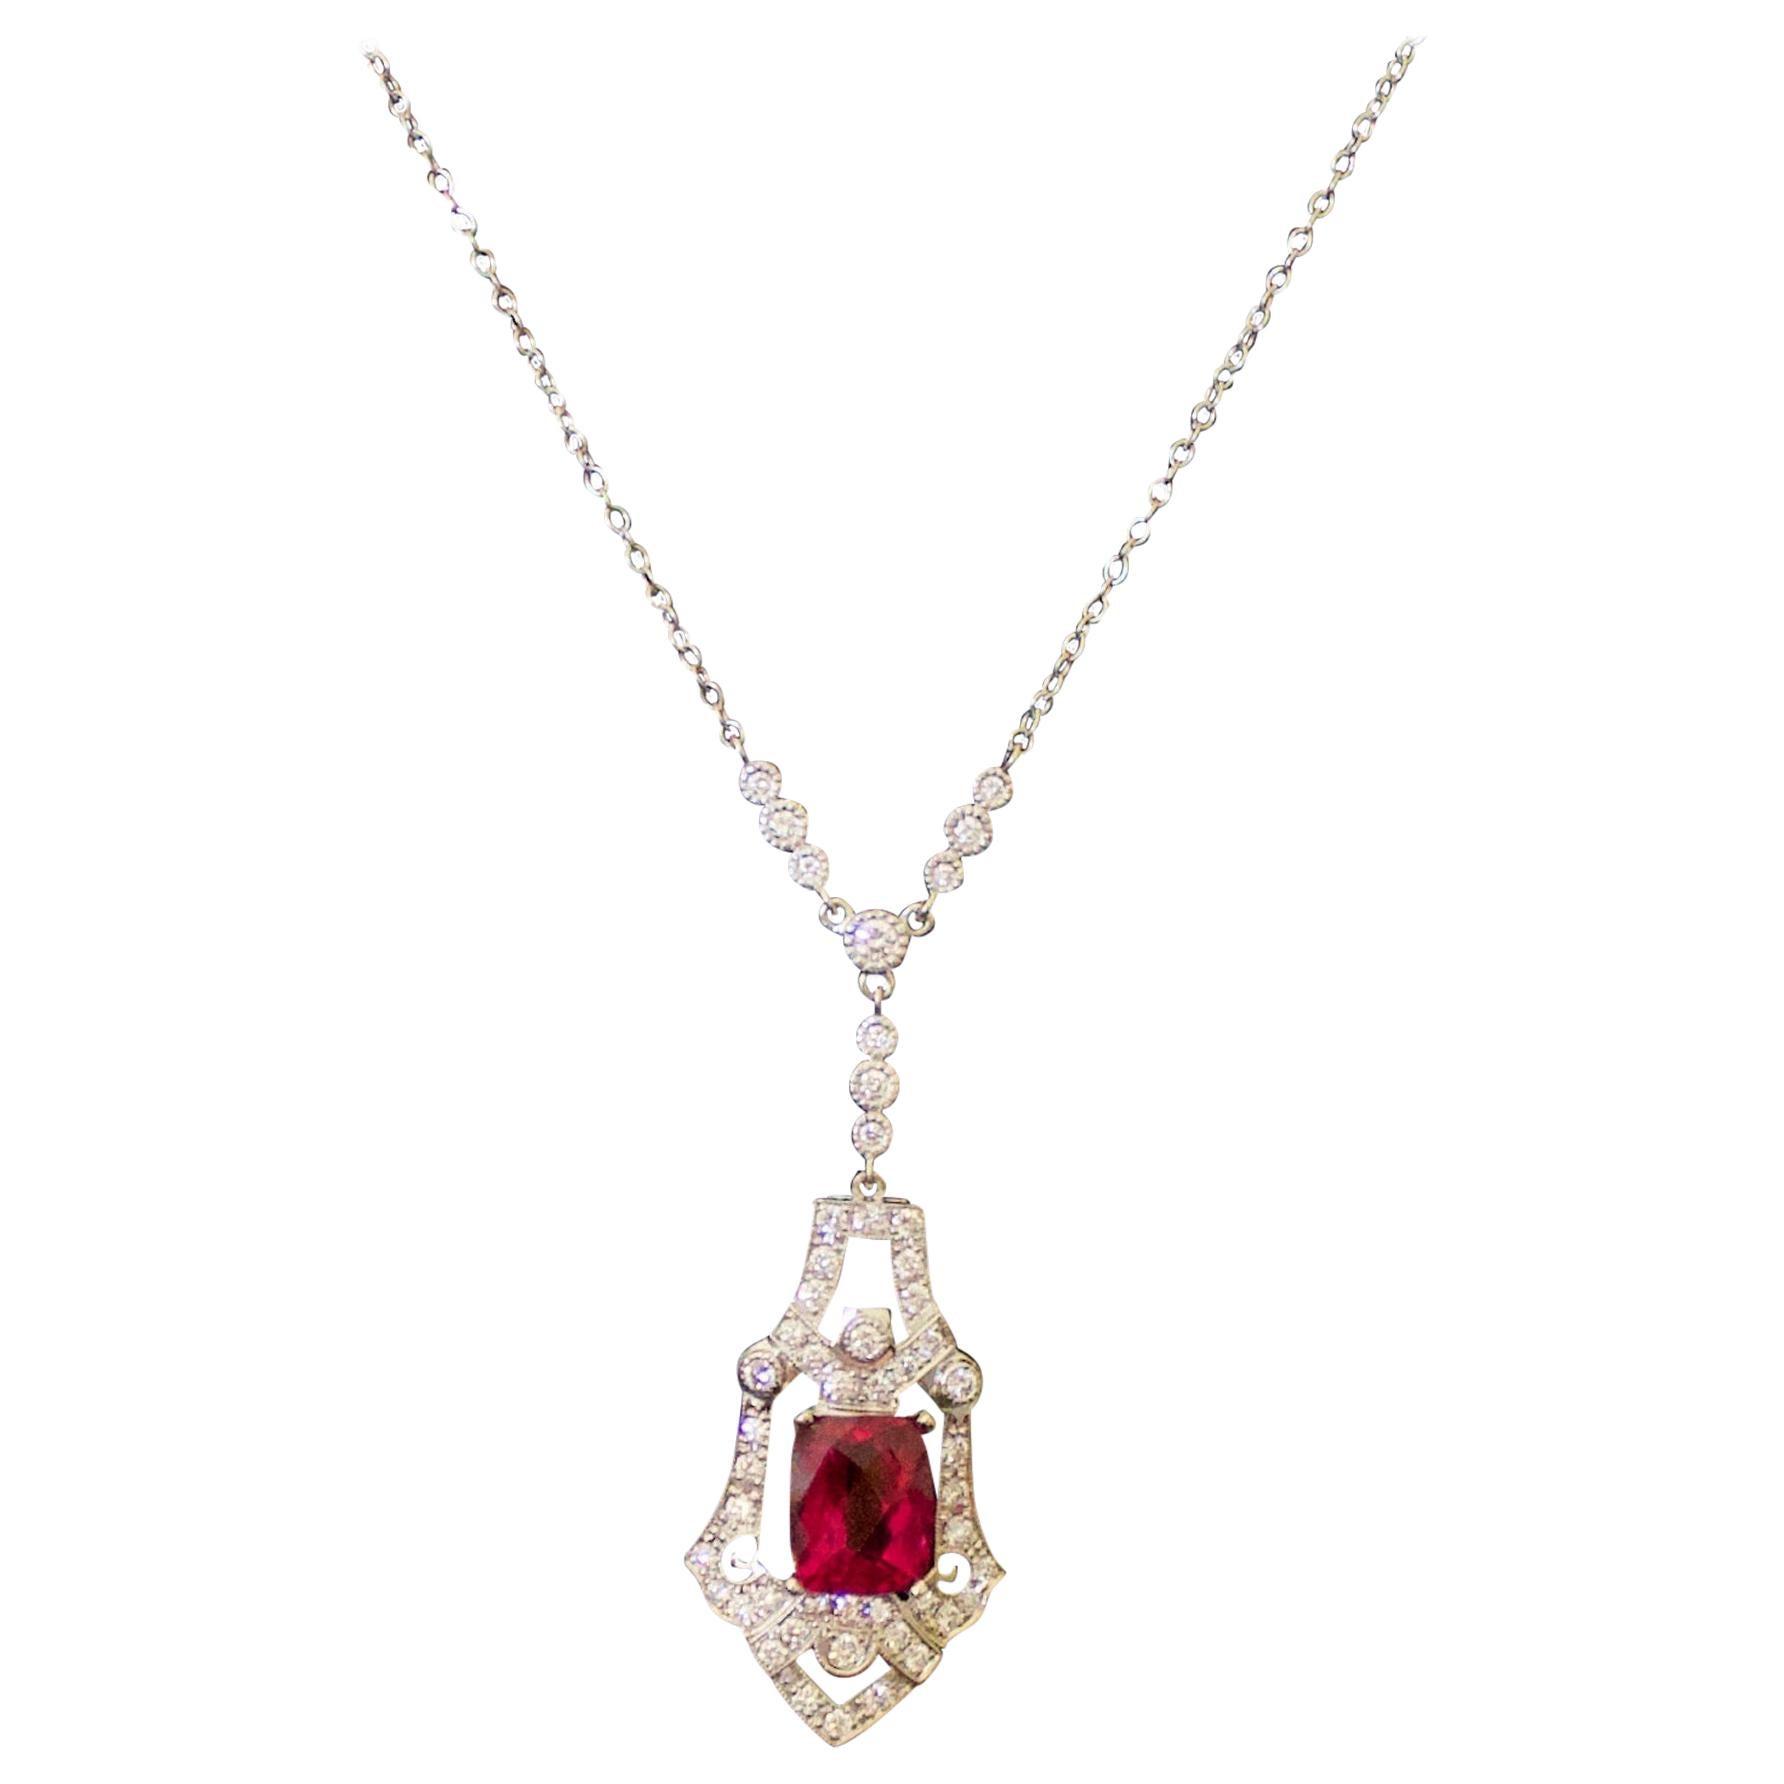 Rubelite and Diamond Necklace in 18 Karat White Gold